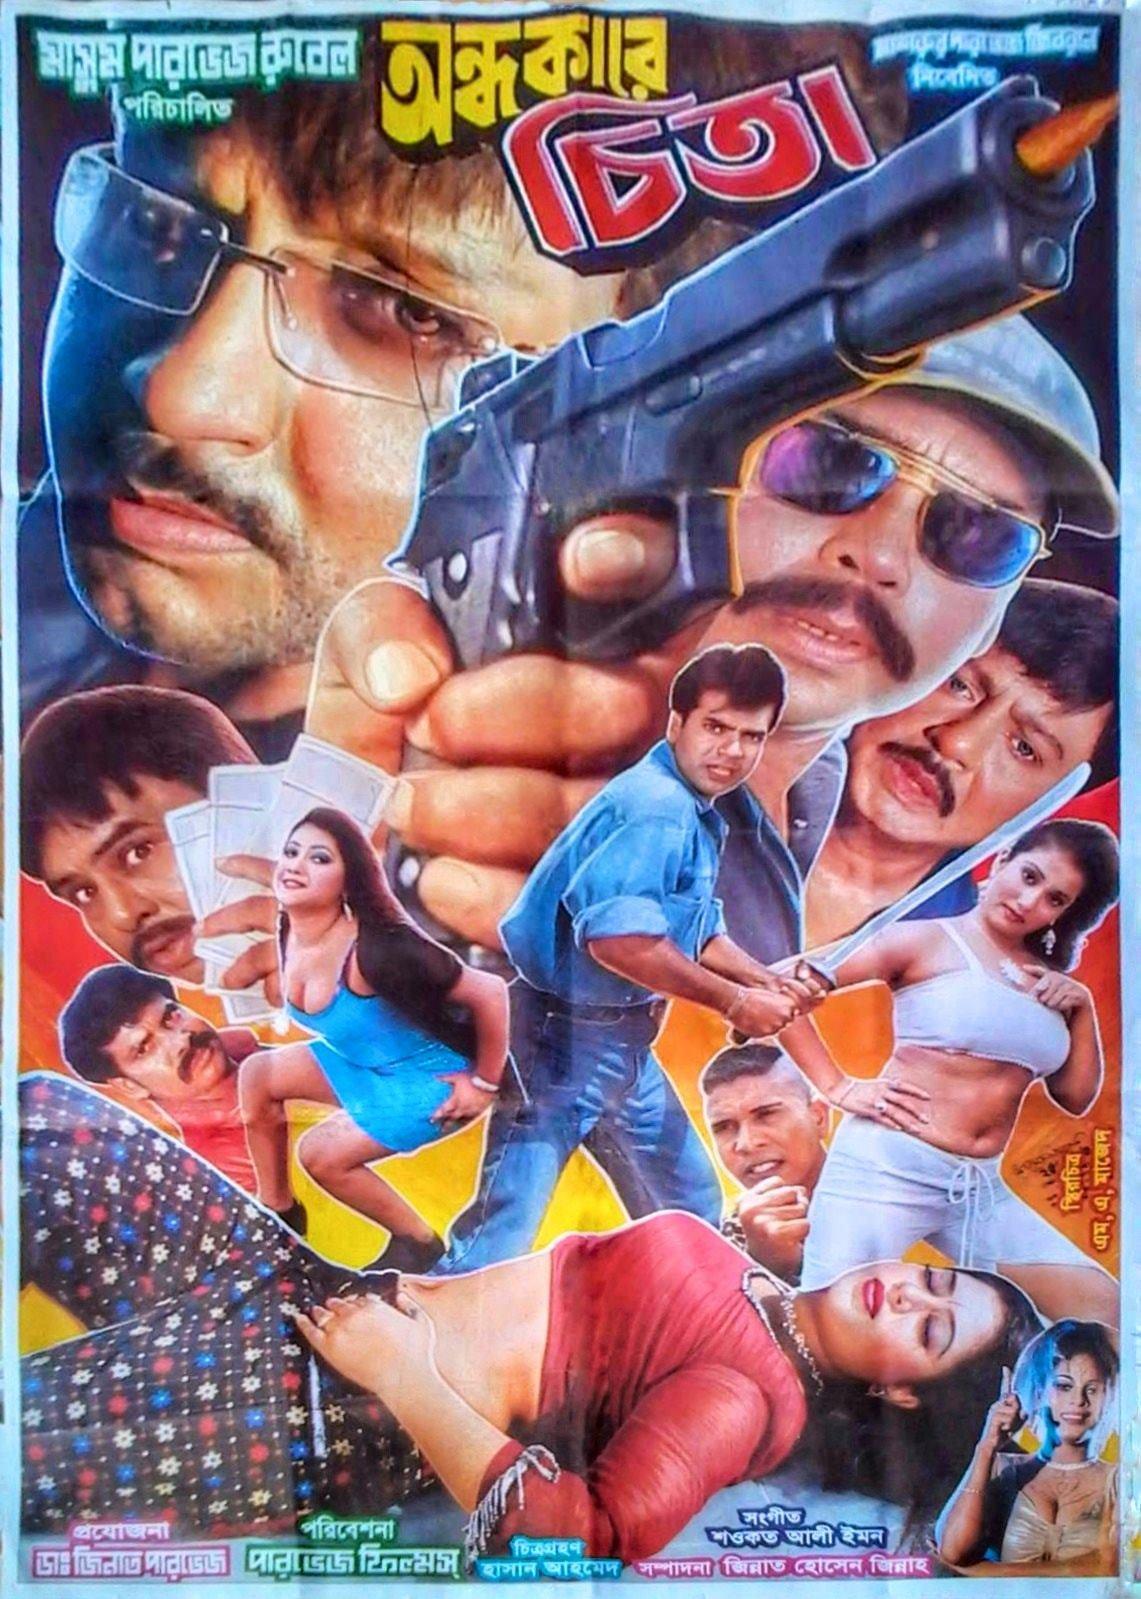 18+ Ondhokarer Chita (2021) Bangla Hot Movie 720p HDRip 700MB Download